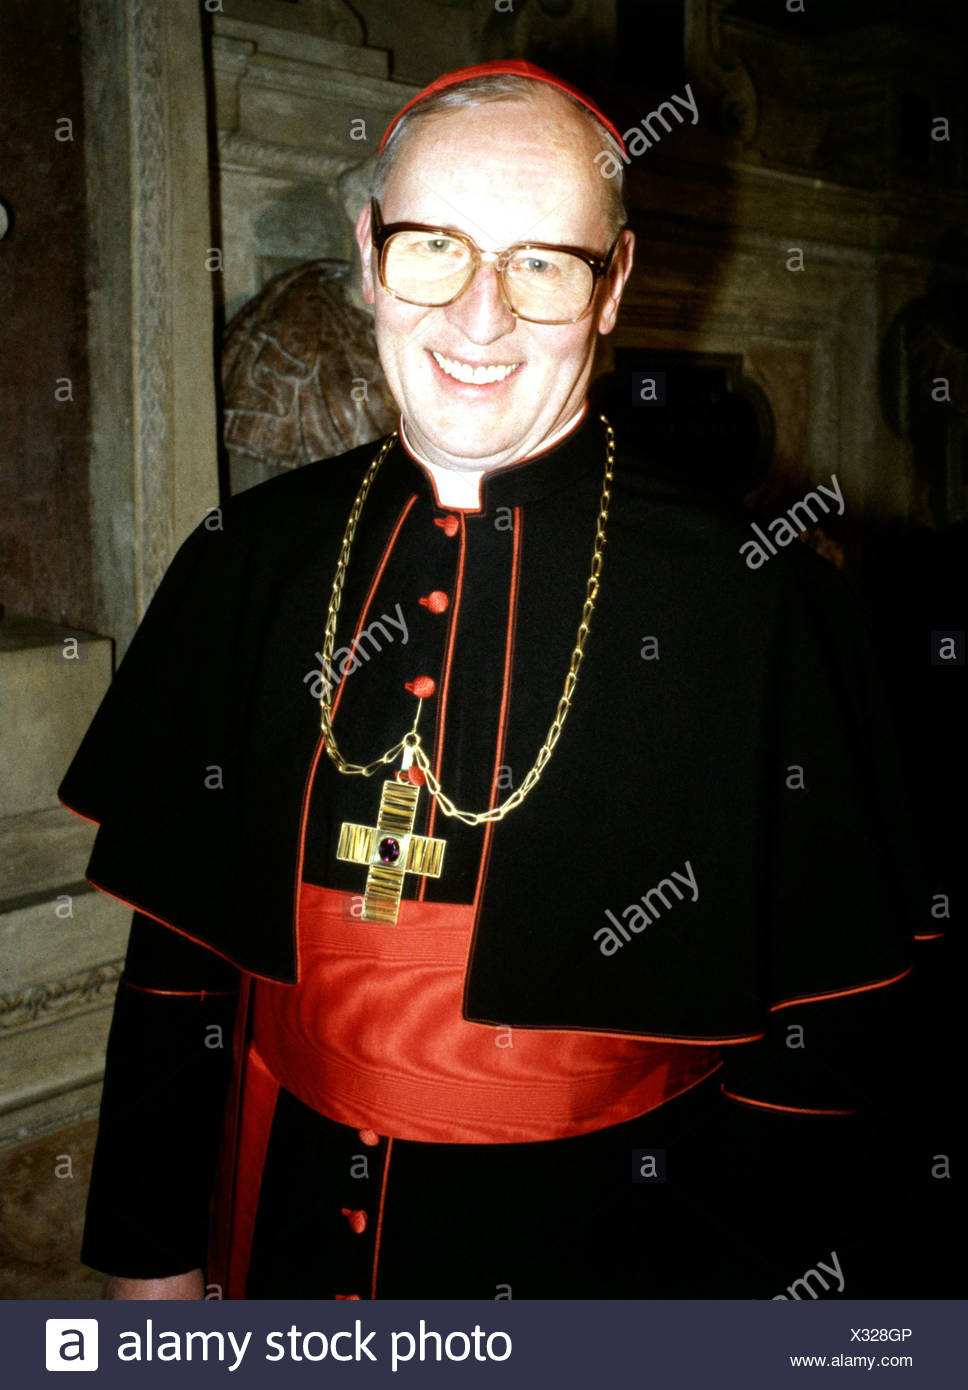 Wetter, Friedrich, Kardinal, * 20.2.1928, German clergyman, Archbishop of Munich, half length, high official, dignitary, dignita - Stock Image